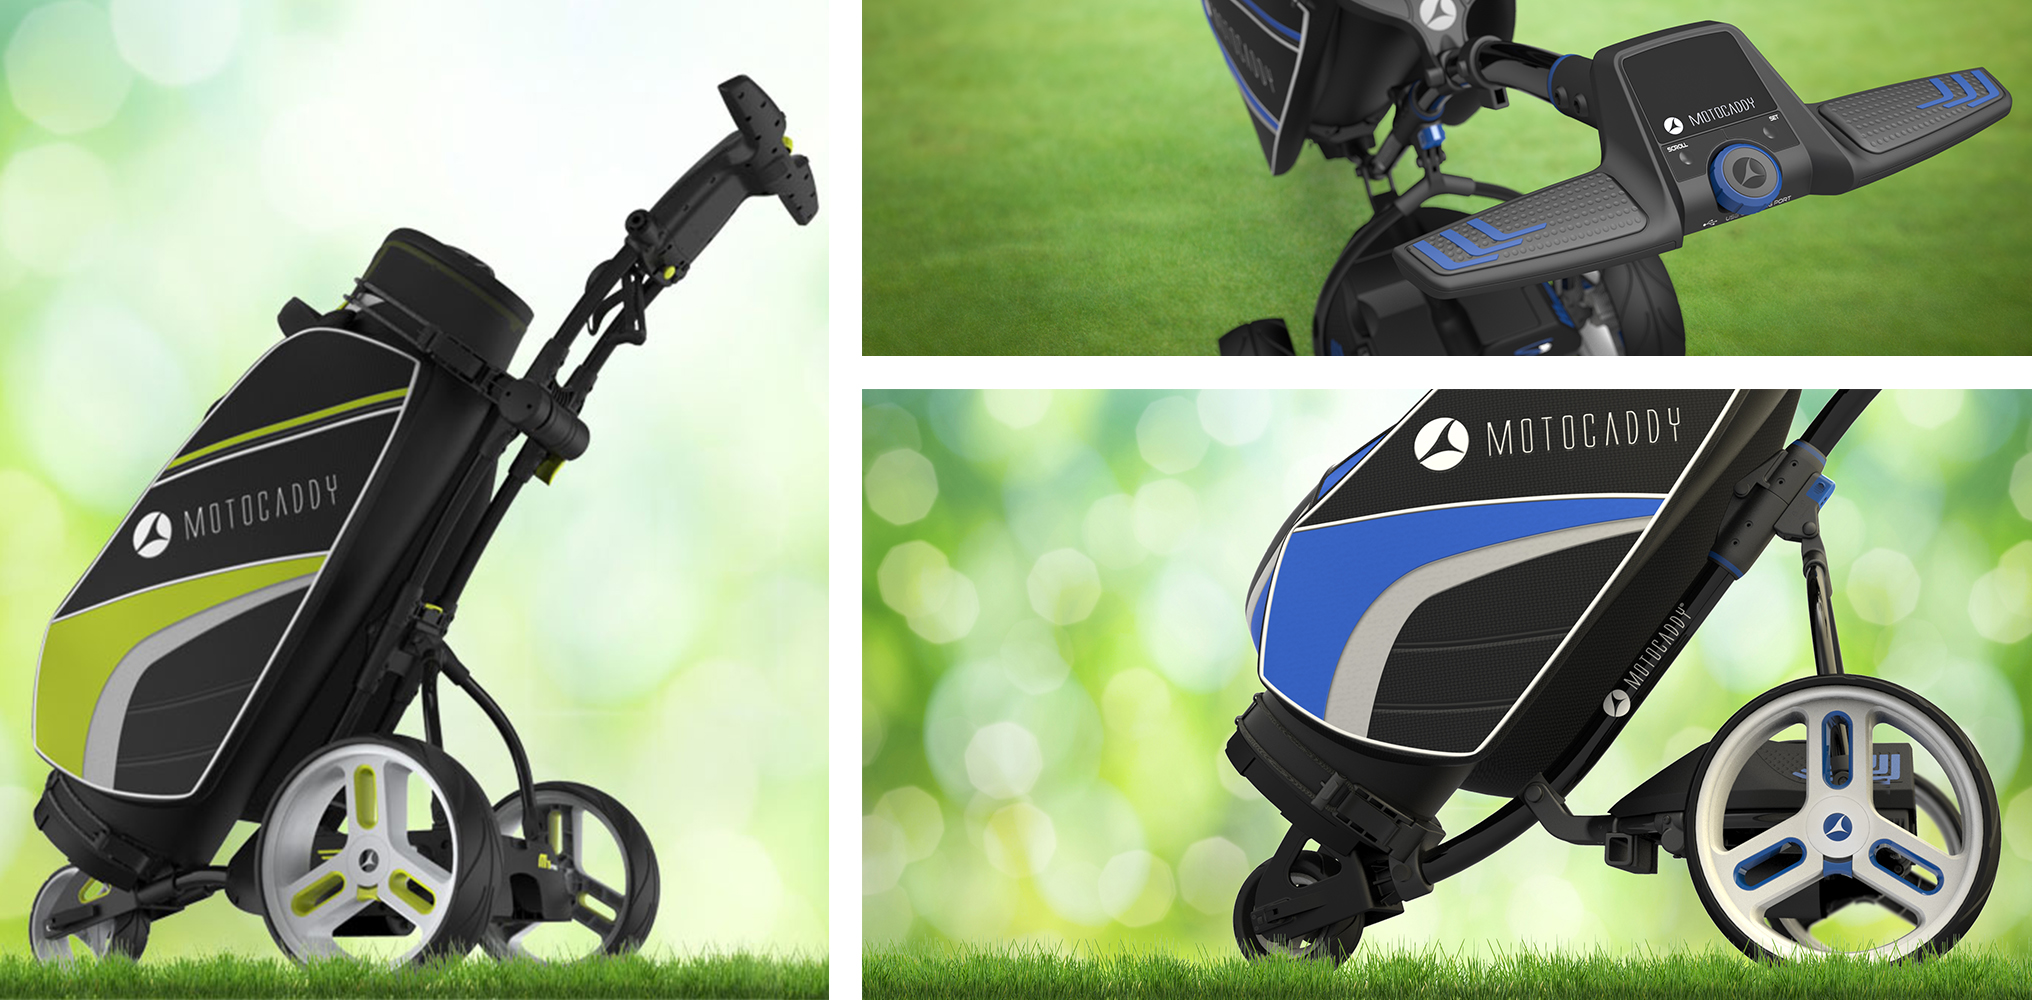 Motocaddy - M1 Pro - Golf trolley - grass - m series - golf